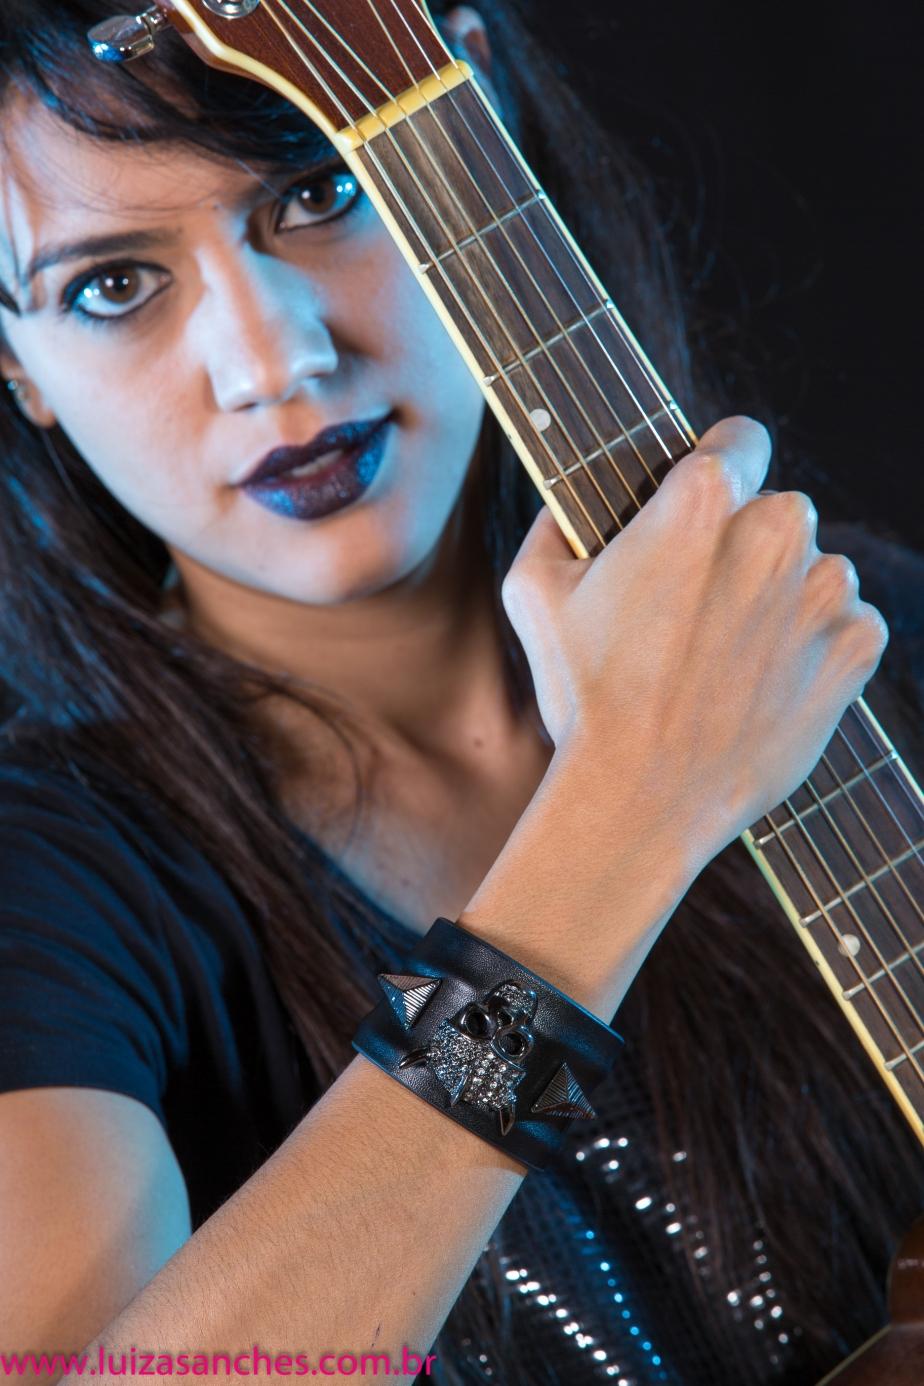 Blog da Luiza Sanches 1-22